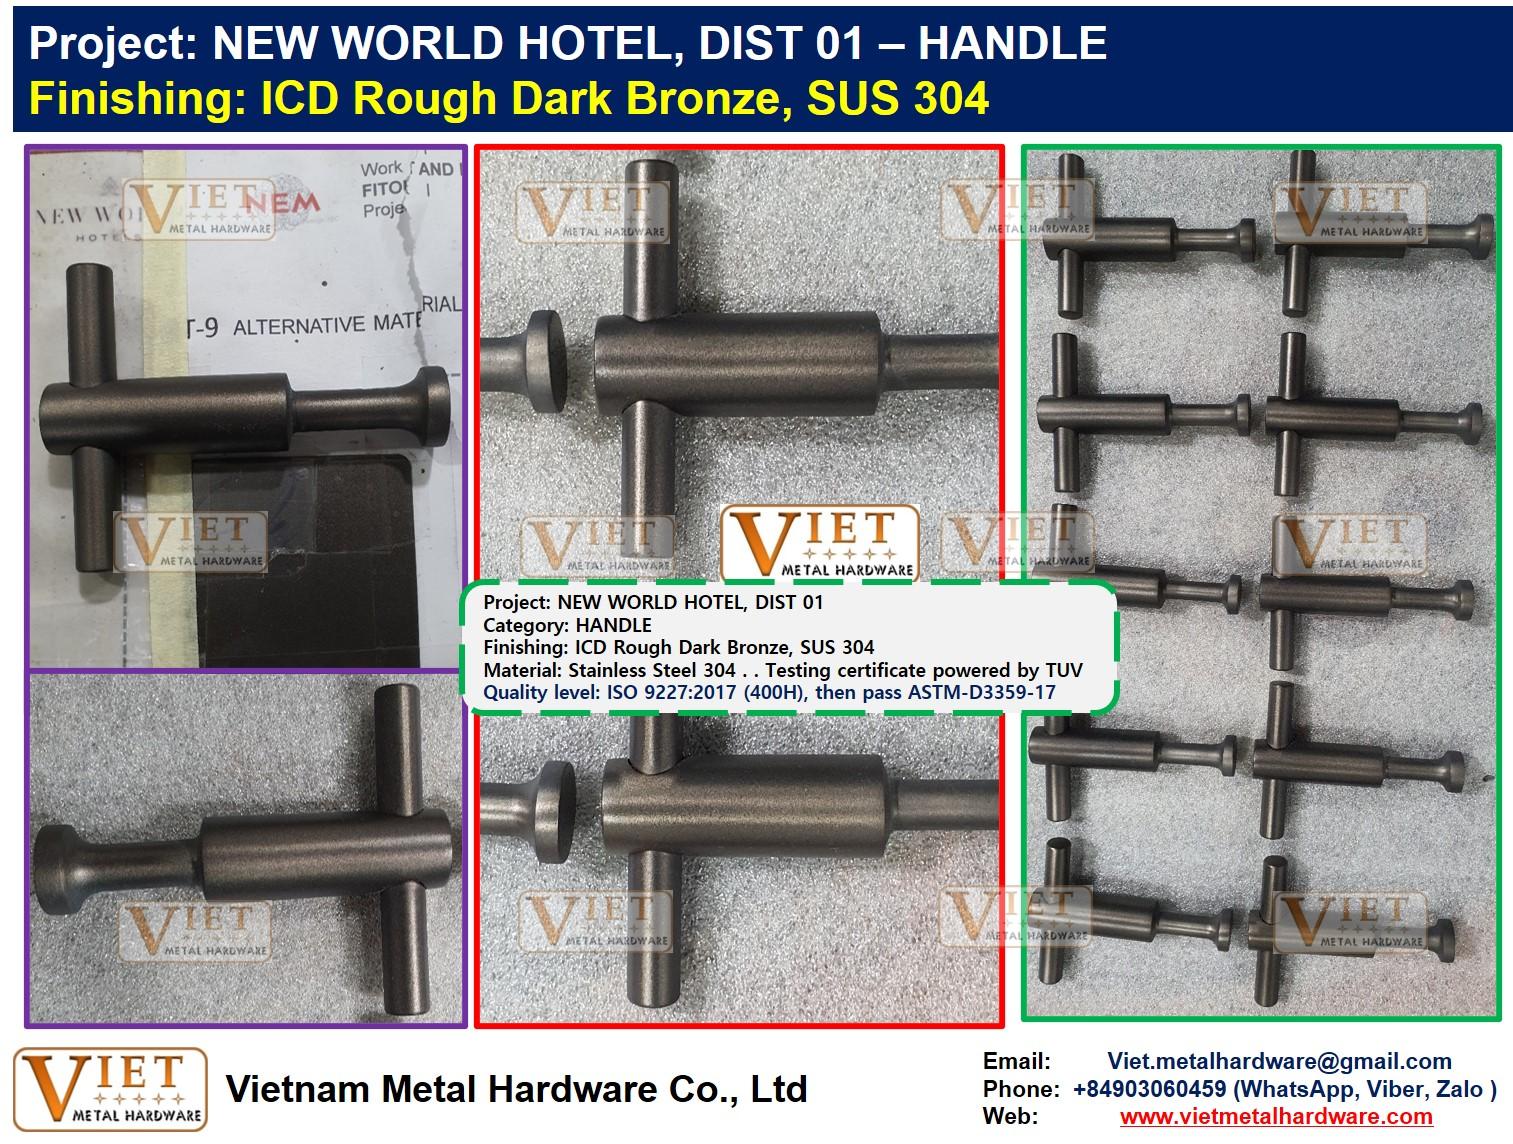 NEW WORLD HOTEL, HANDLE  ICD Rough Dark Bronze, SUS 304